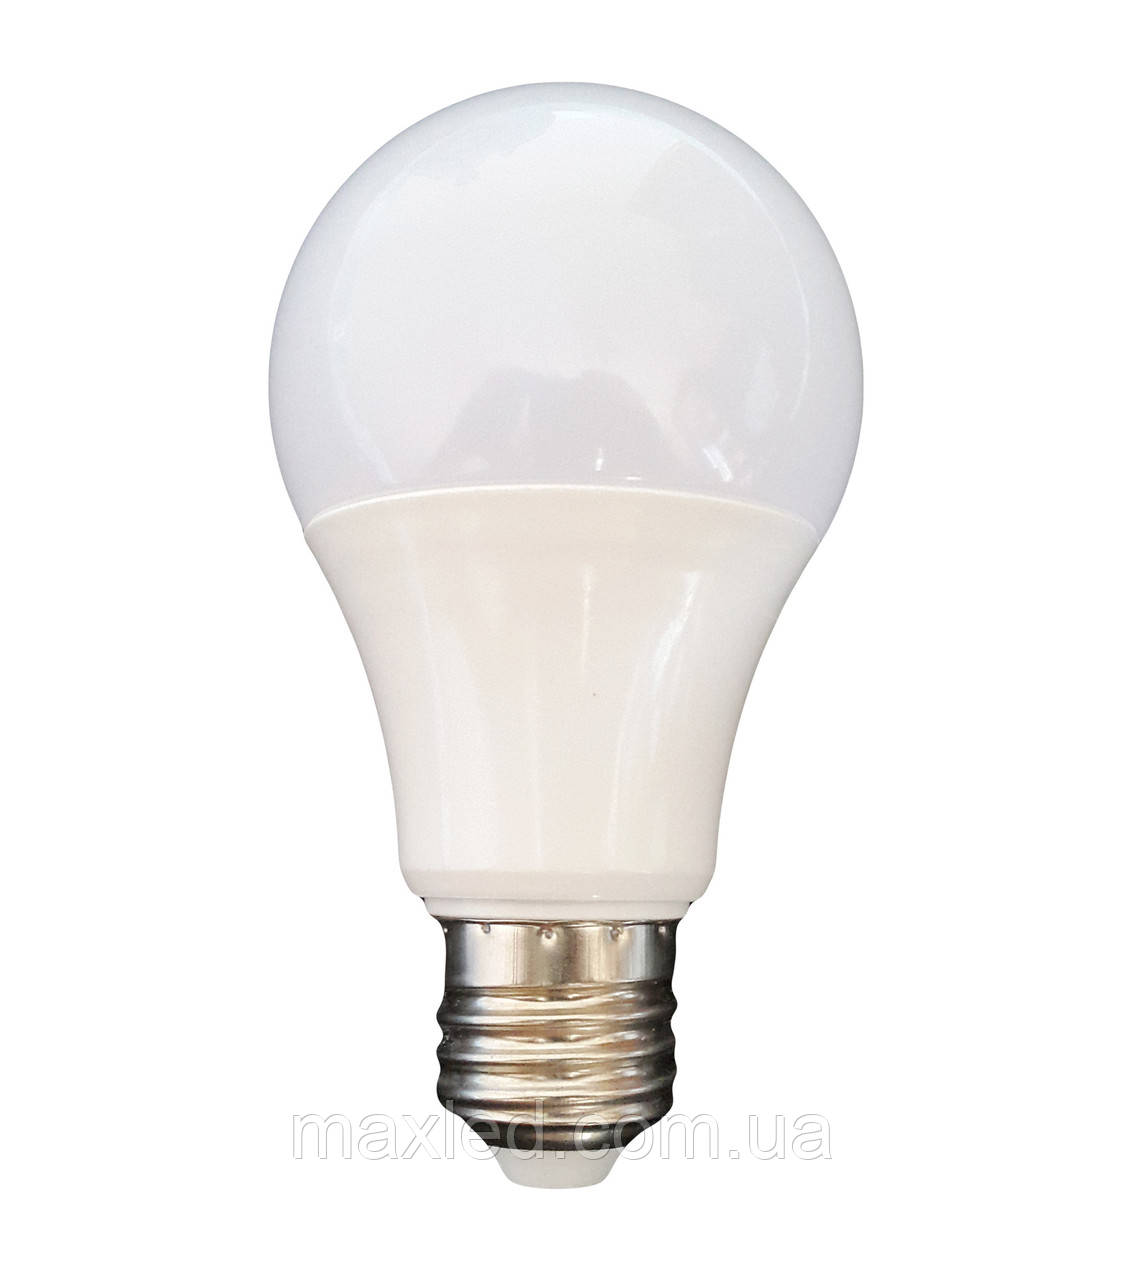 Светодиодная лампа  9Вт EA9WWE27 E27